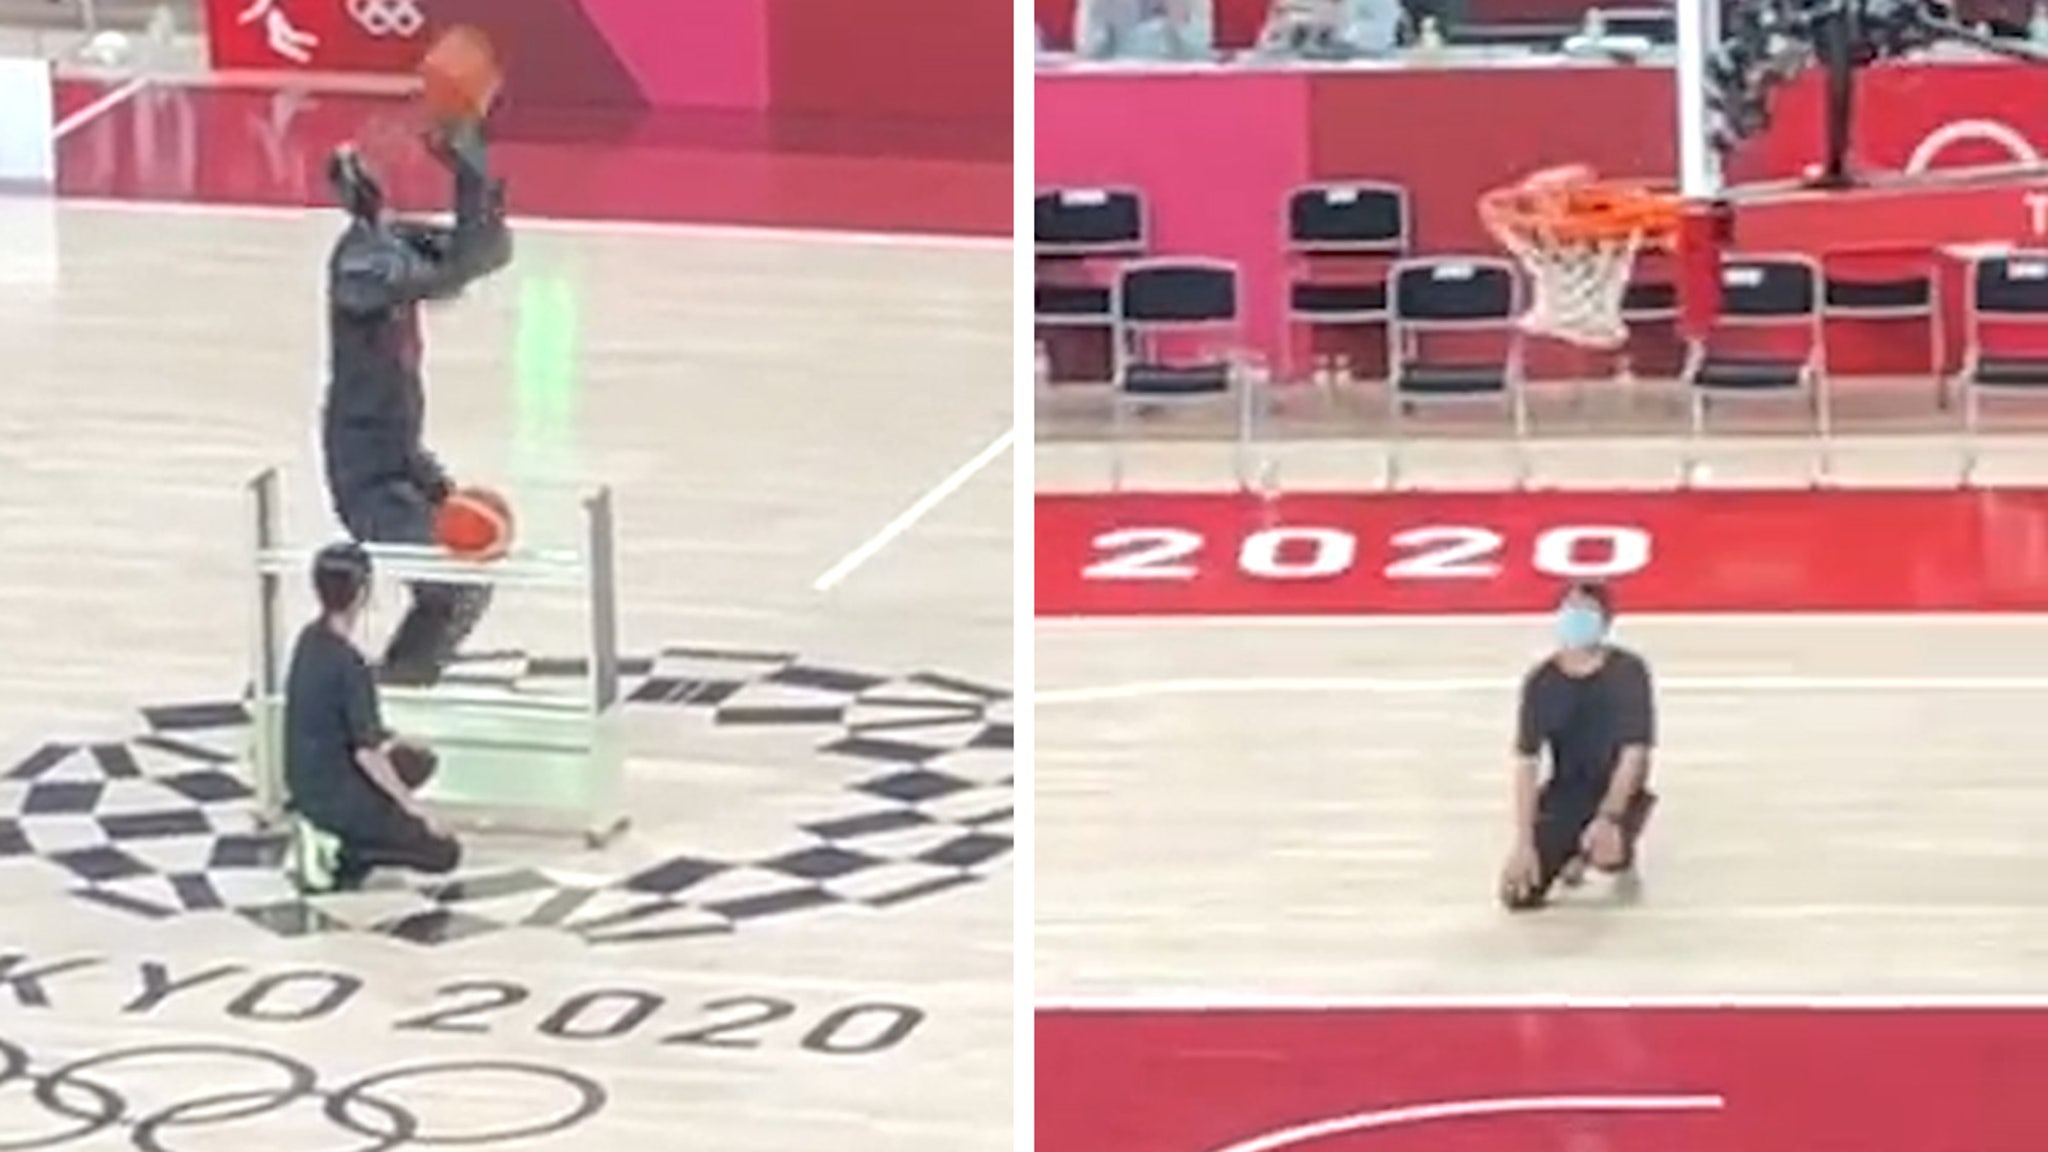 Basketball Robot at Tokyo Olympics Drowns Half-Court Shot, No Problem